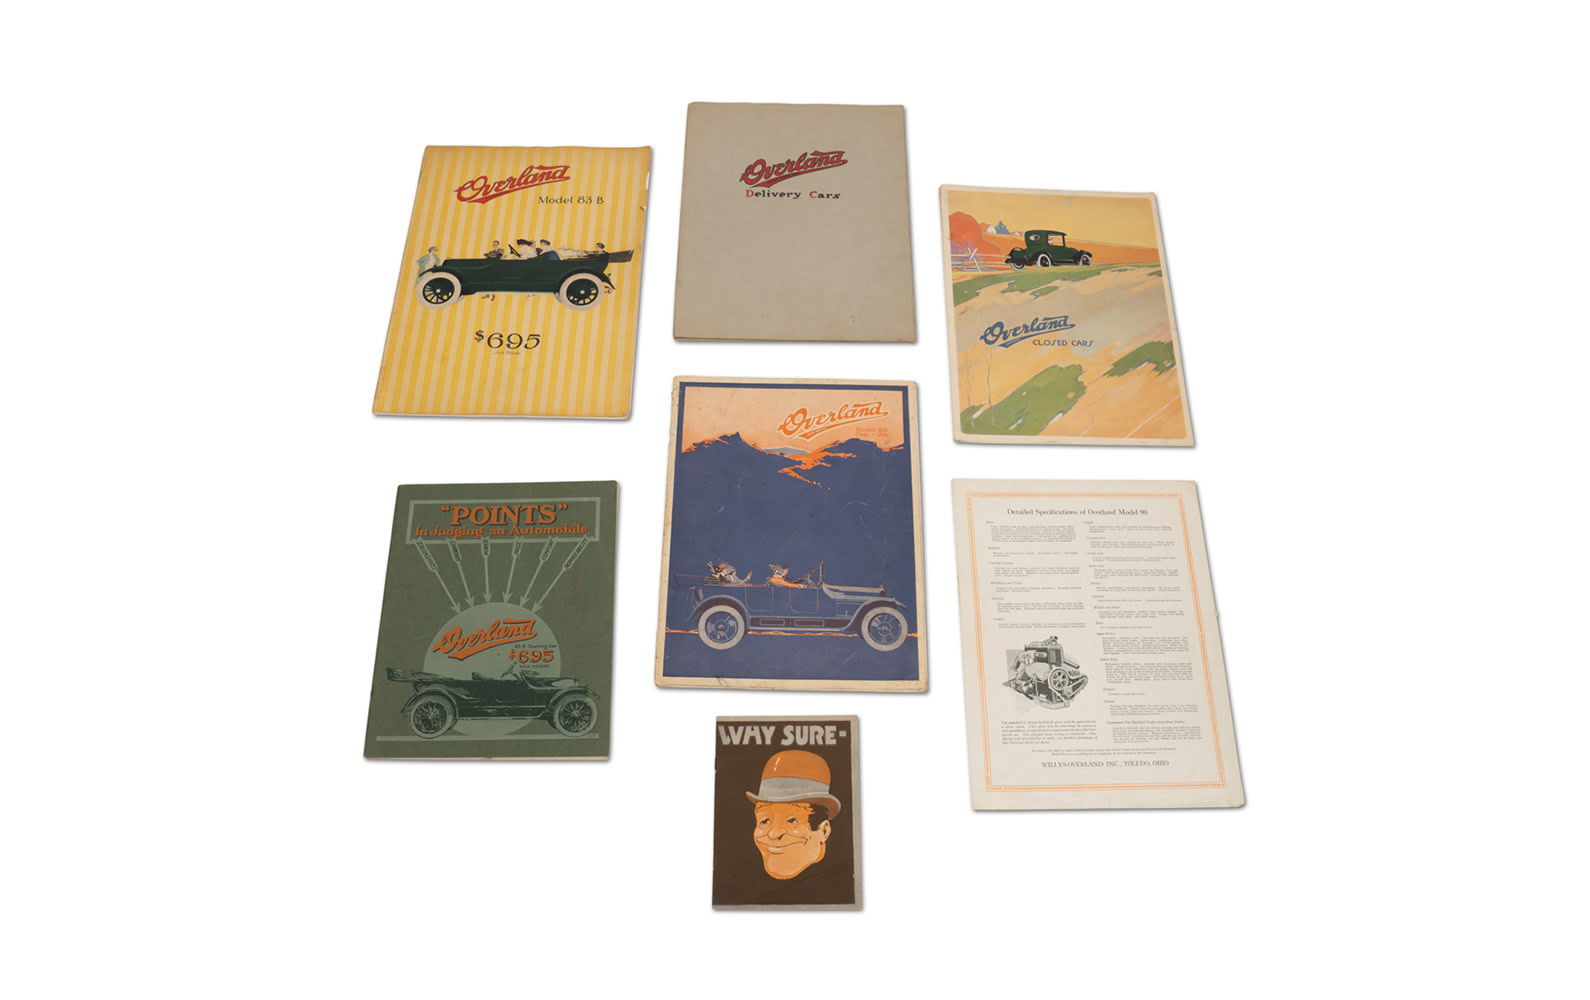 Assorted Overland Literature